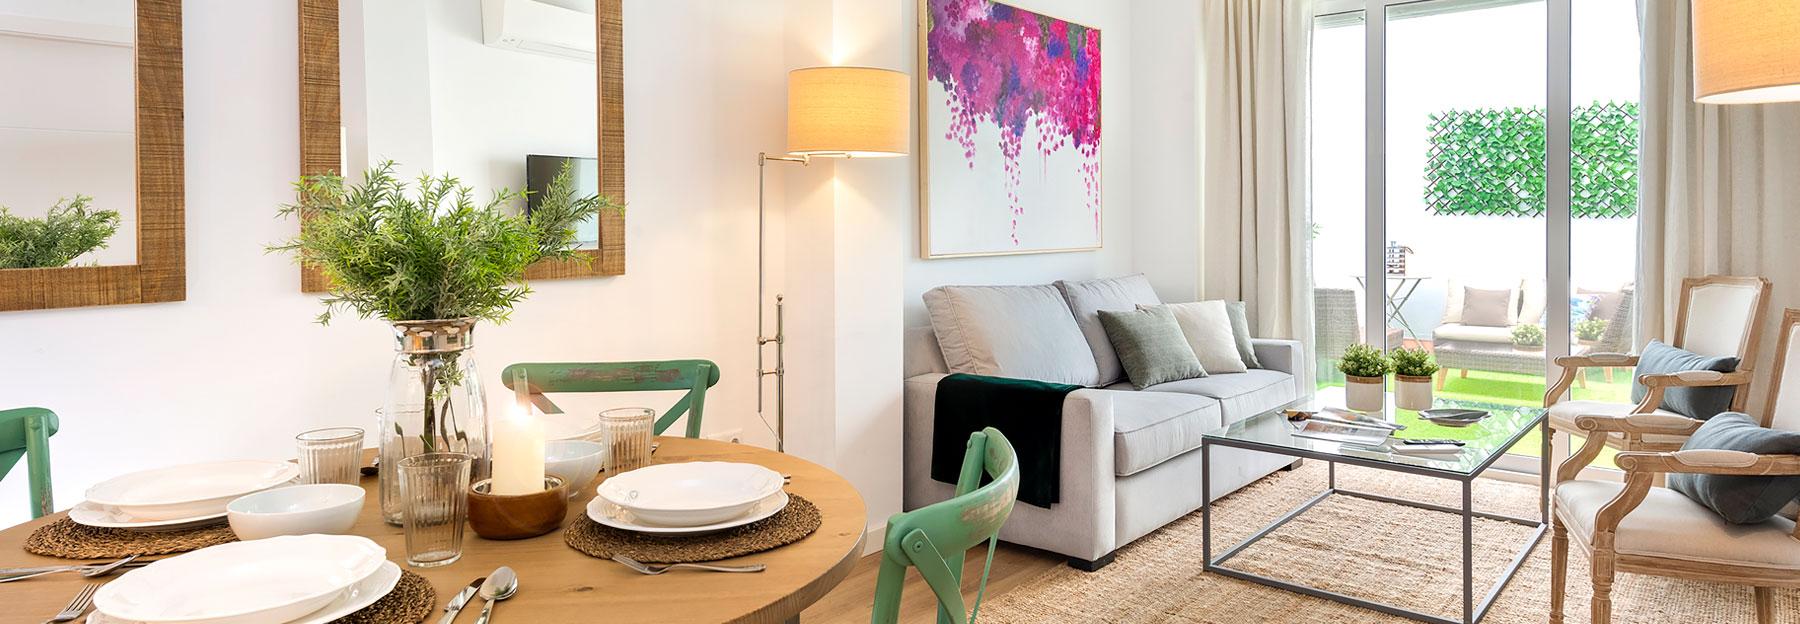 Luxury Apartment in Seville